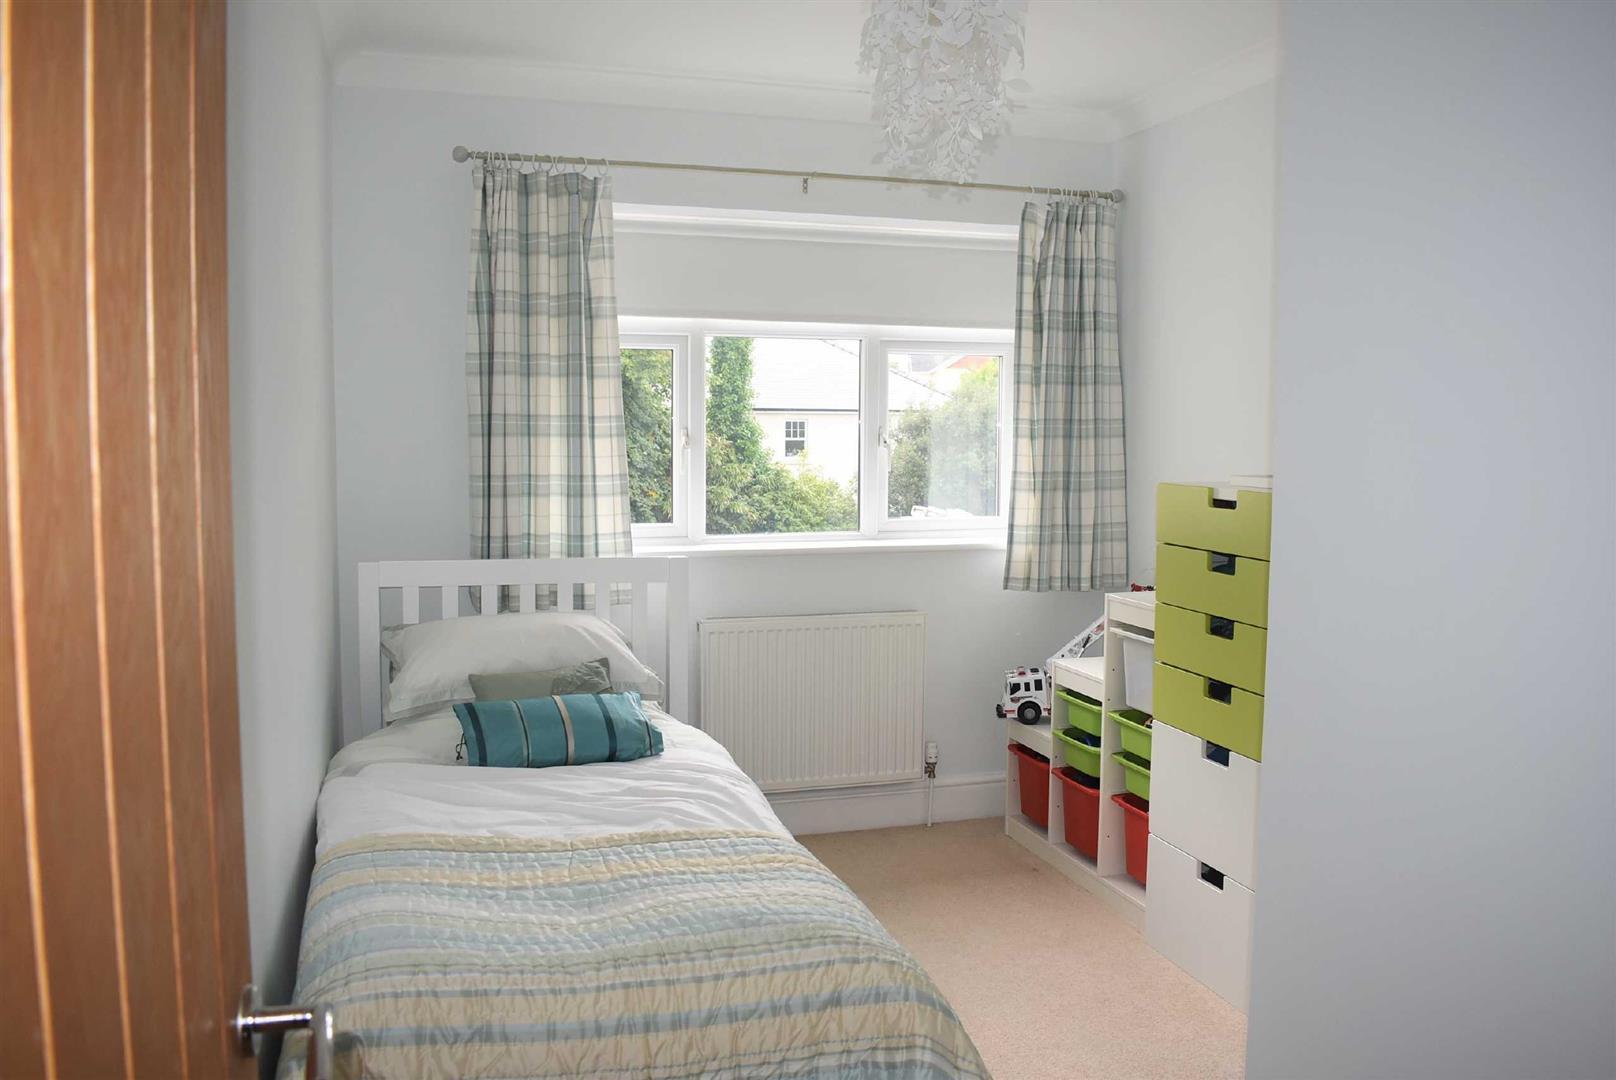 Southward Lane, Langland, Swansea, SA3 4QE